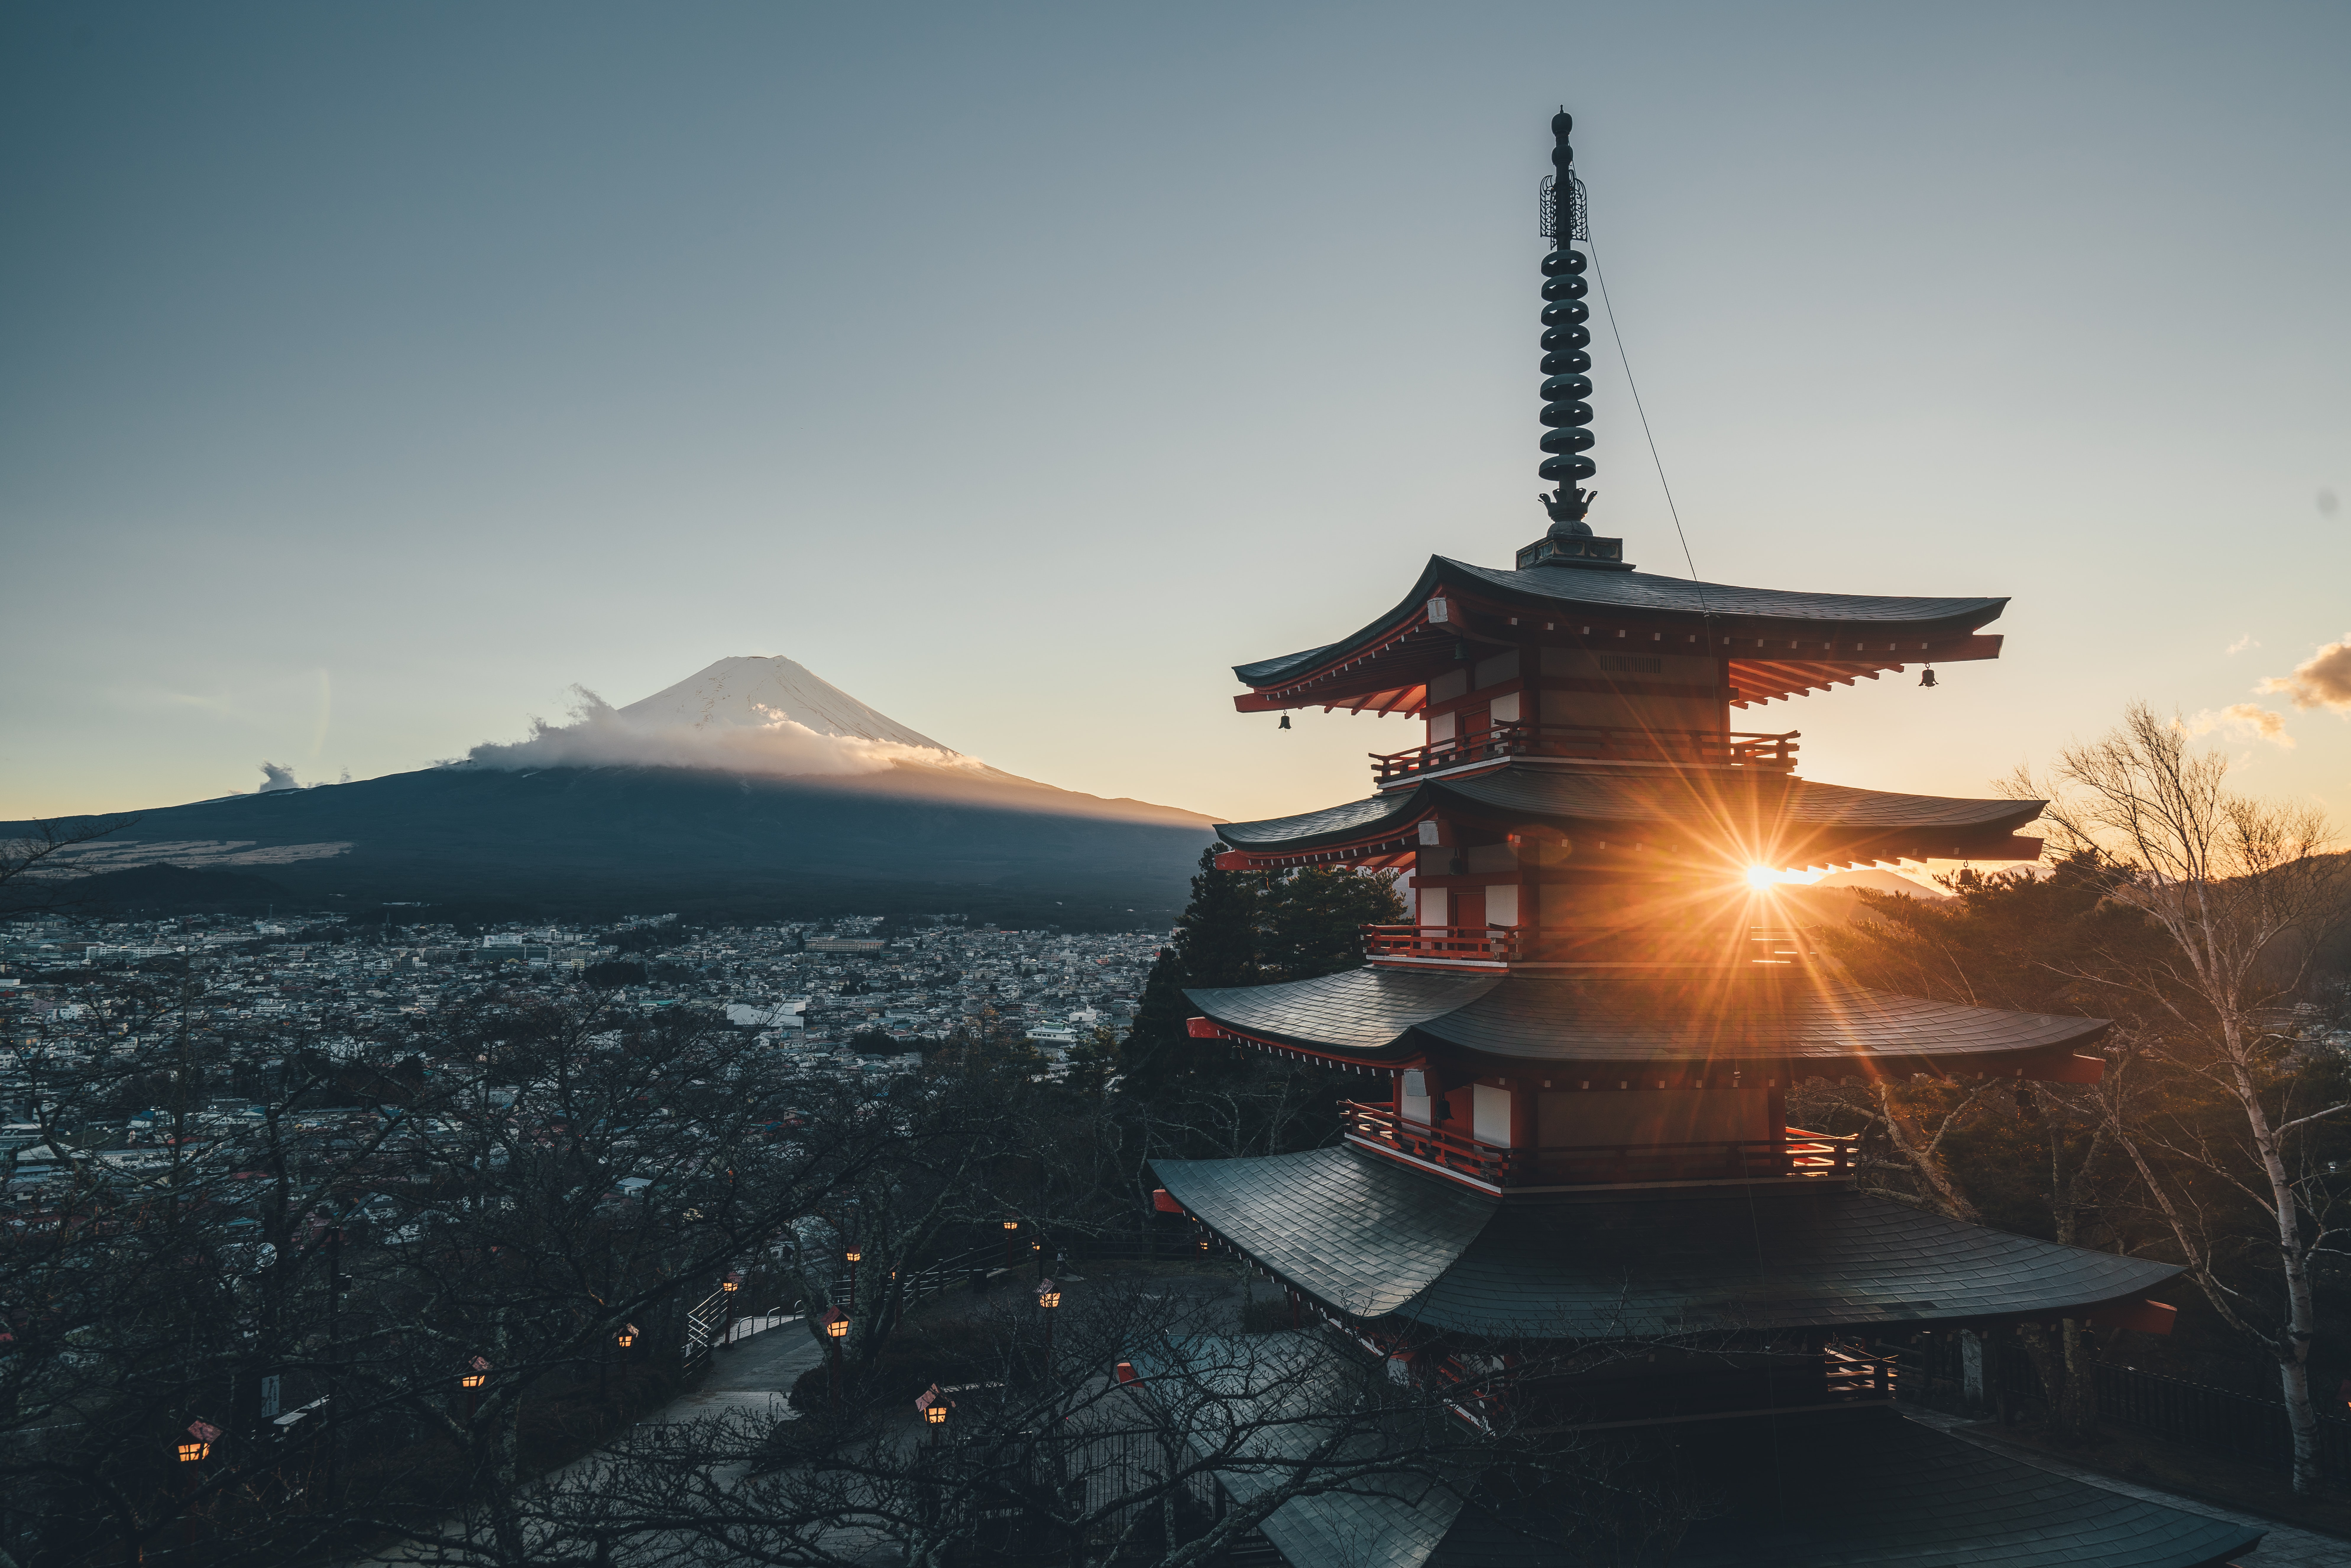 FCM expands global footprint into Japan